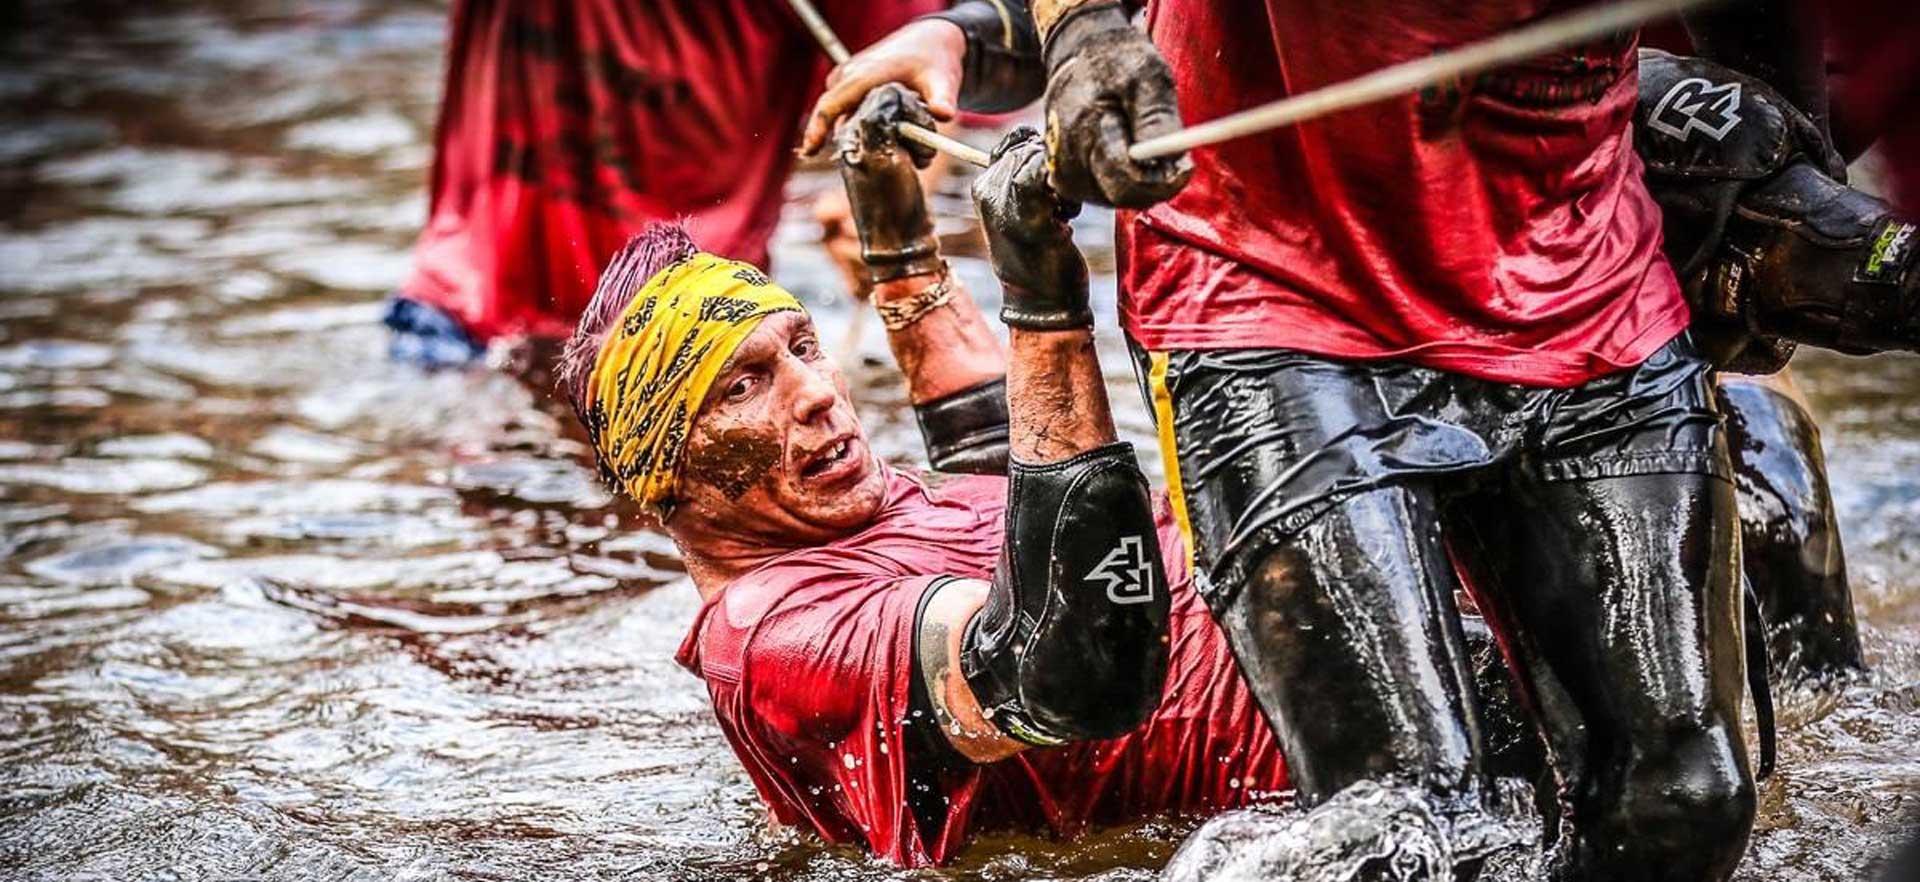 Shaun Gash: Purpose Driven Adventure Athlete